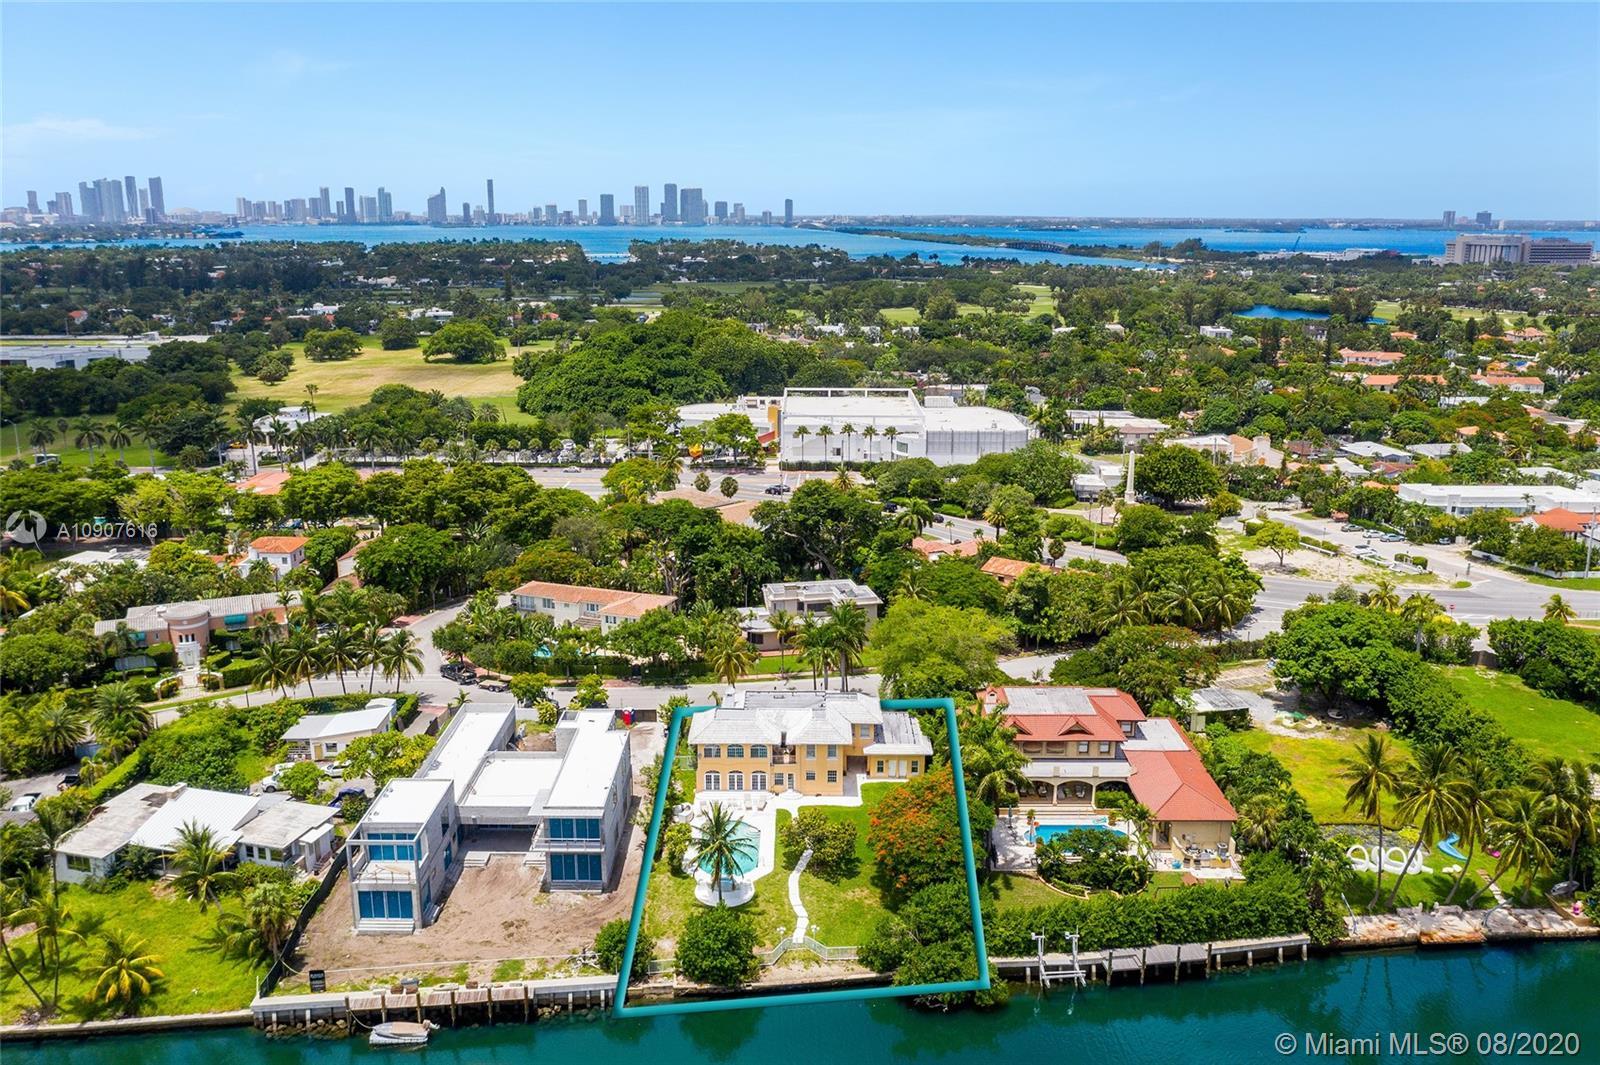 Flamingo Terrace - 2637 Flamingo Dr, Miami Beach, FL 33140